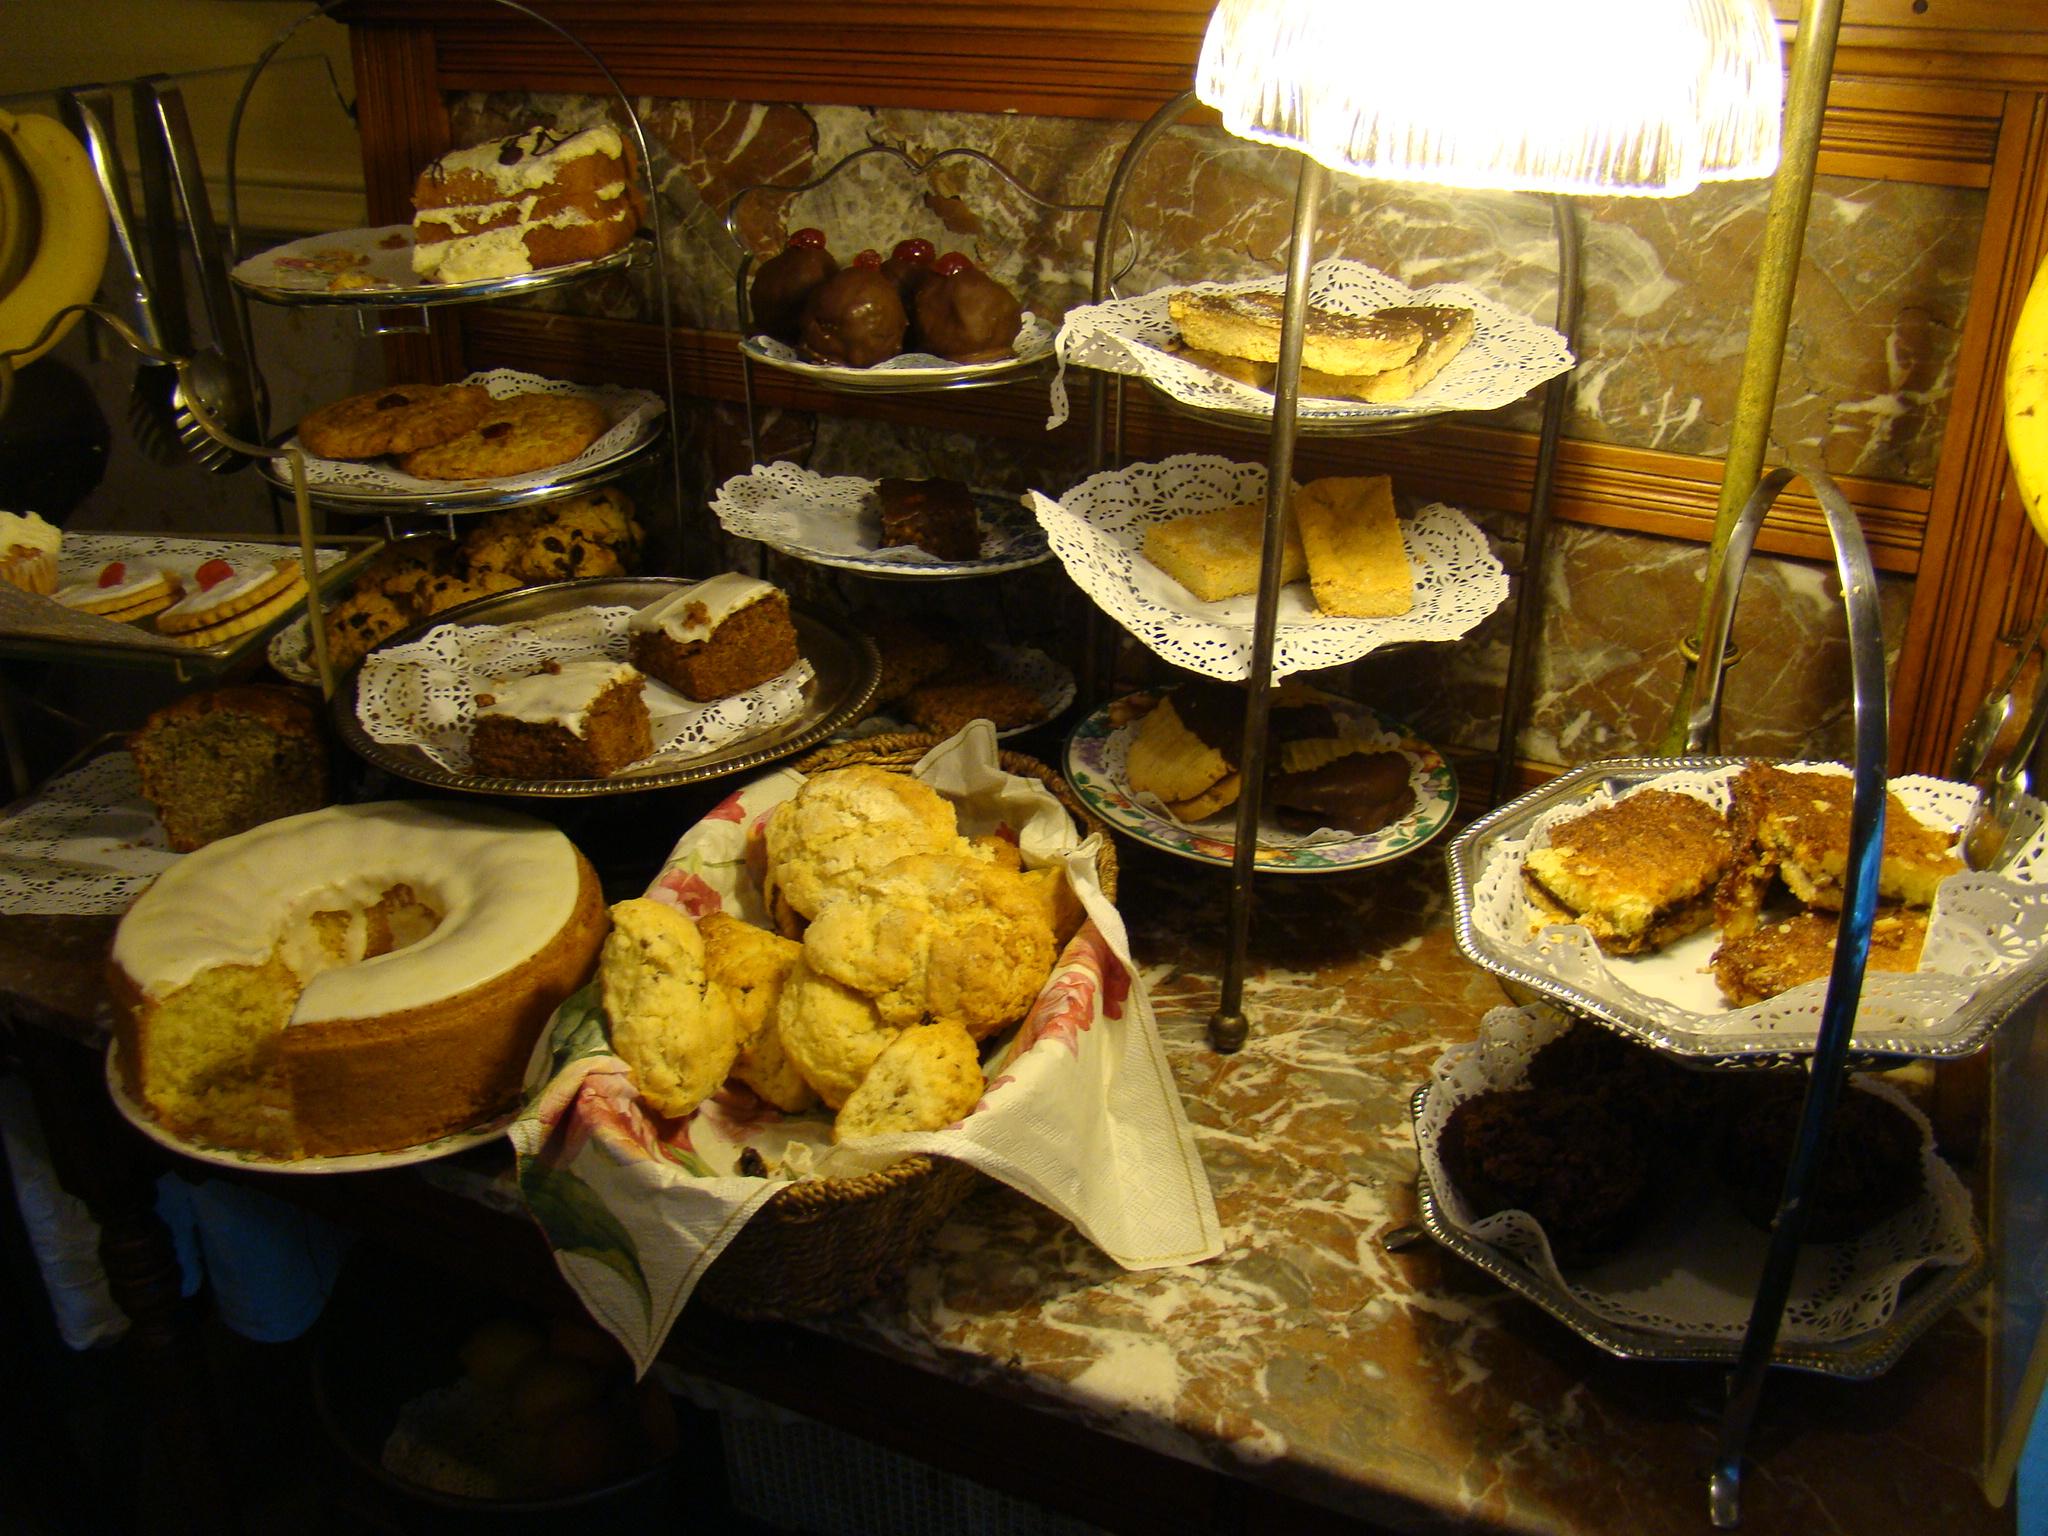 Clarinda's Tea House